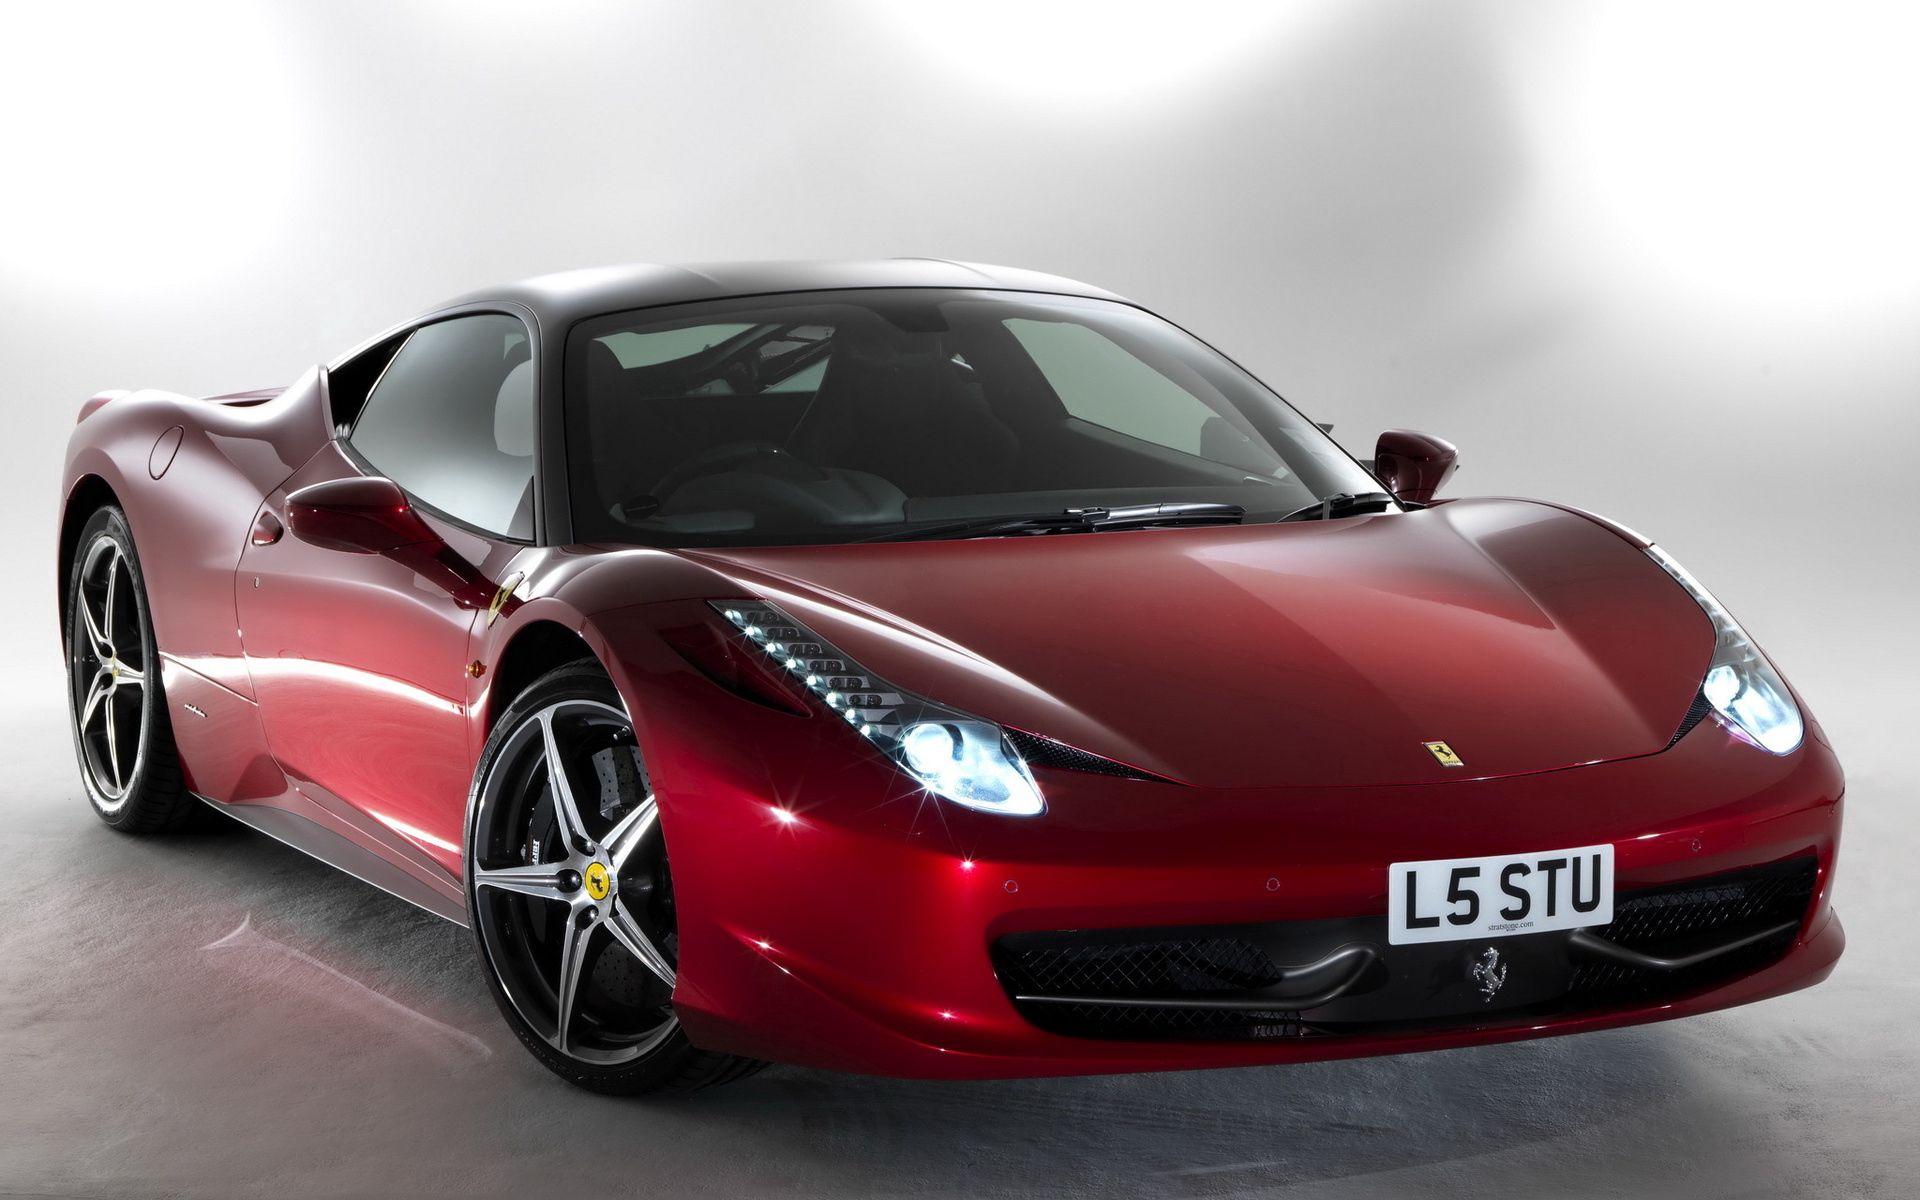 92707 download wallpaper Cars, Ferrari, Supercar, 458, Italia screensavers and pictures for free